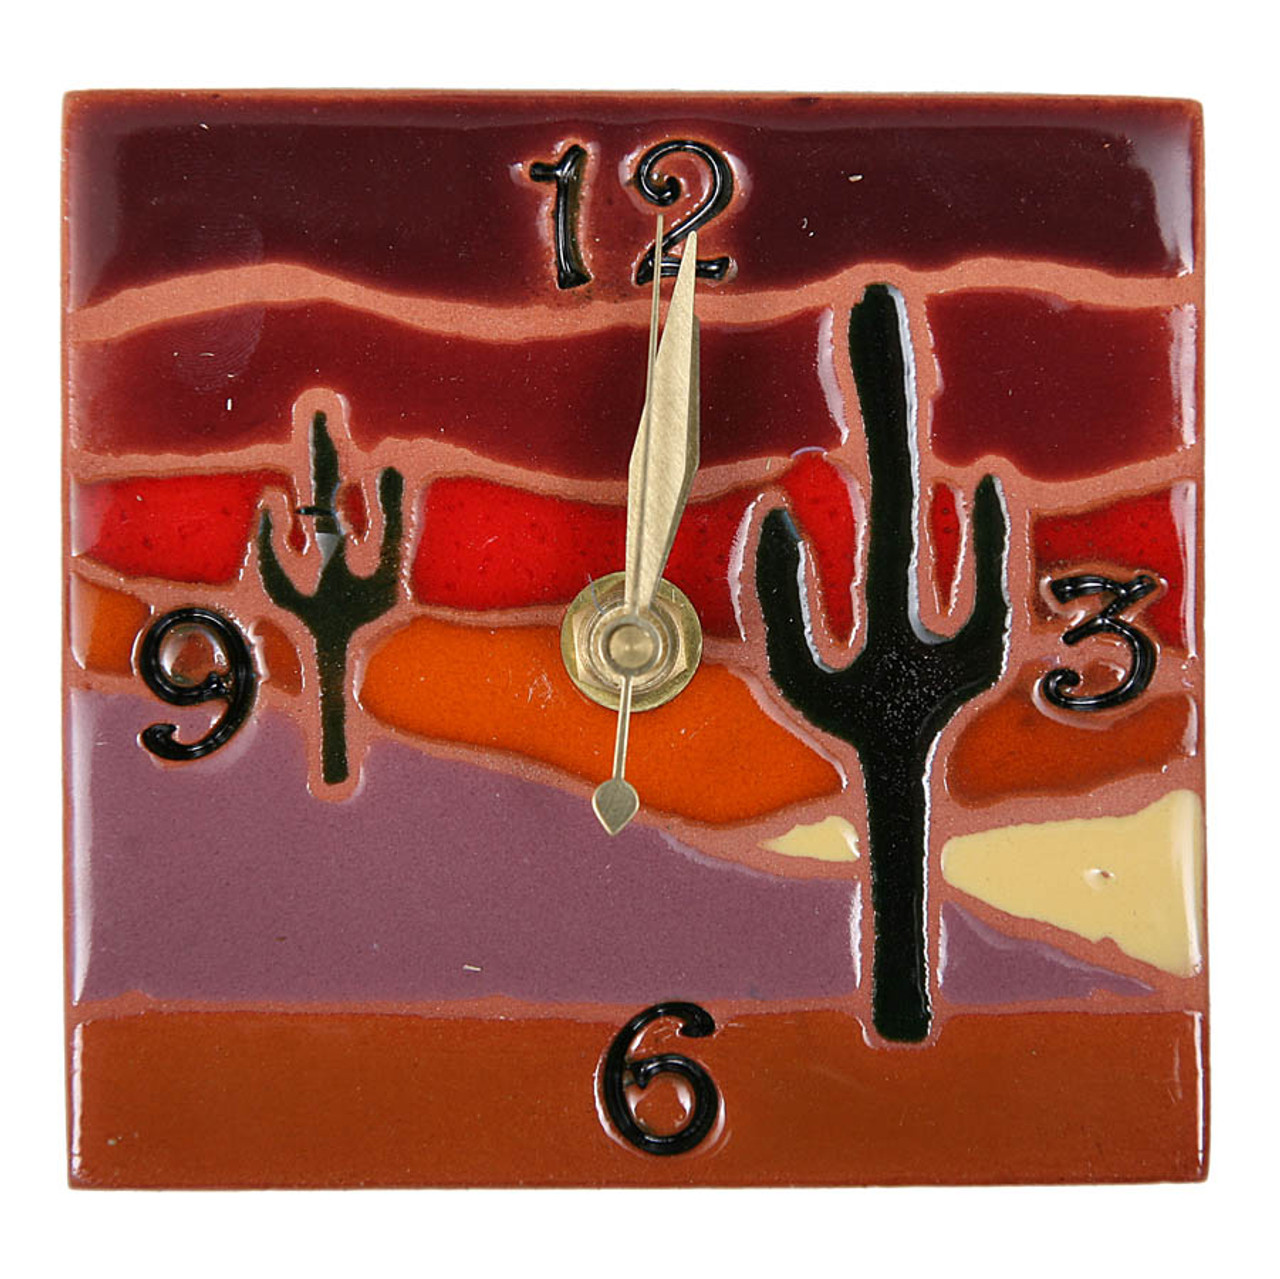 Cactus Scene with Numbers Desk Clock